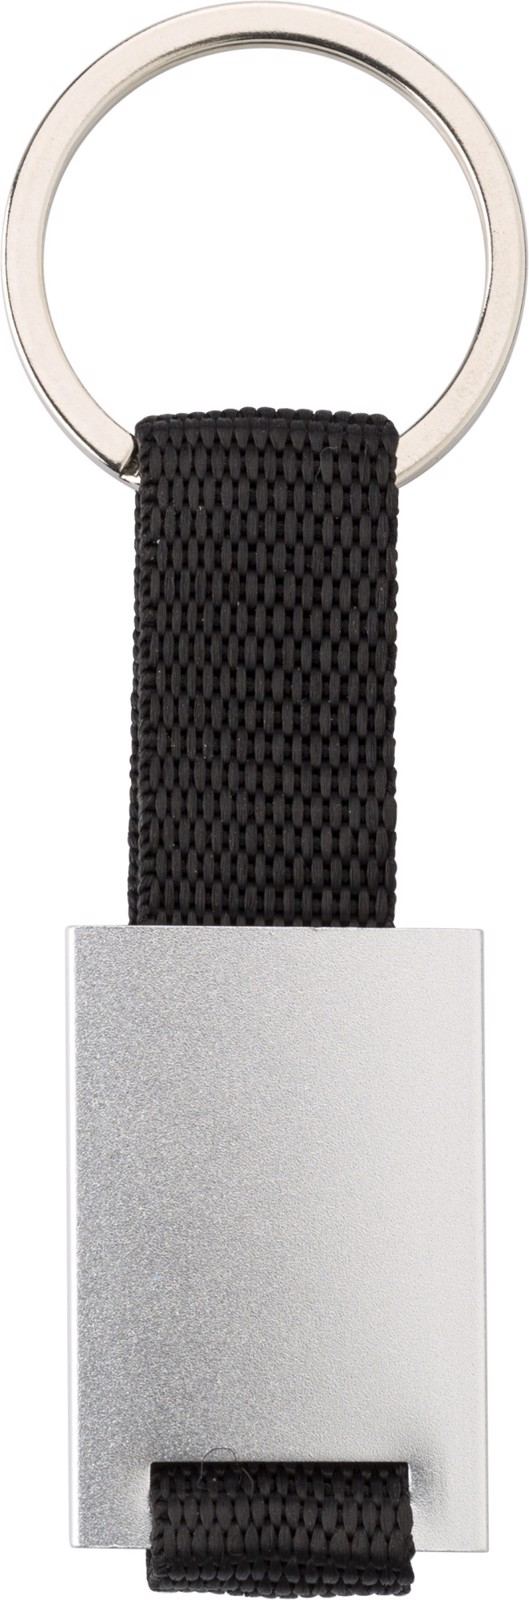 Aluminium key holder - Silver